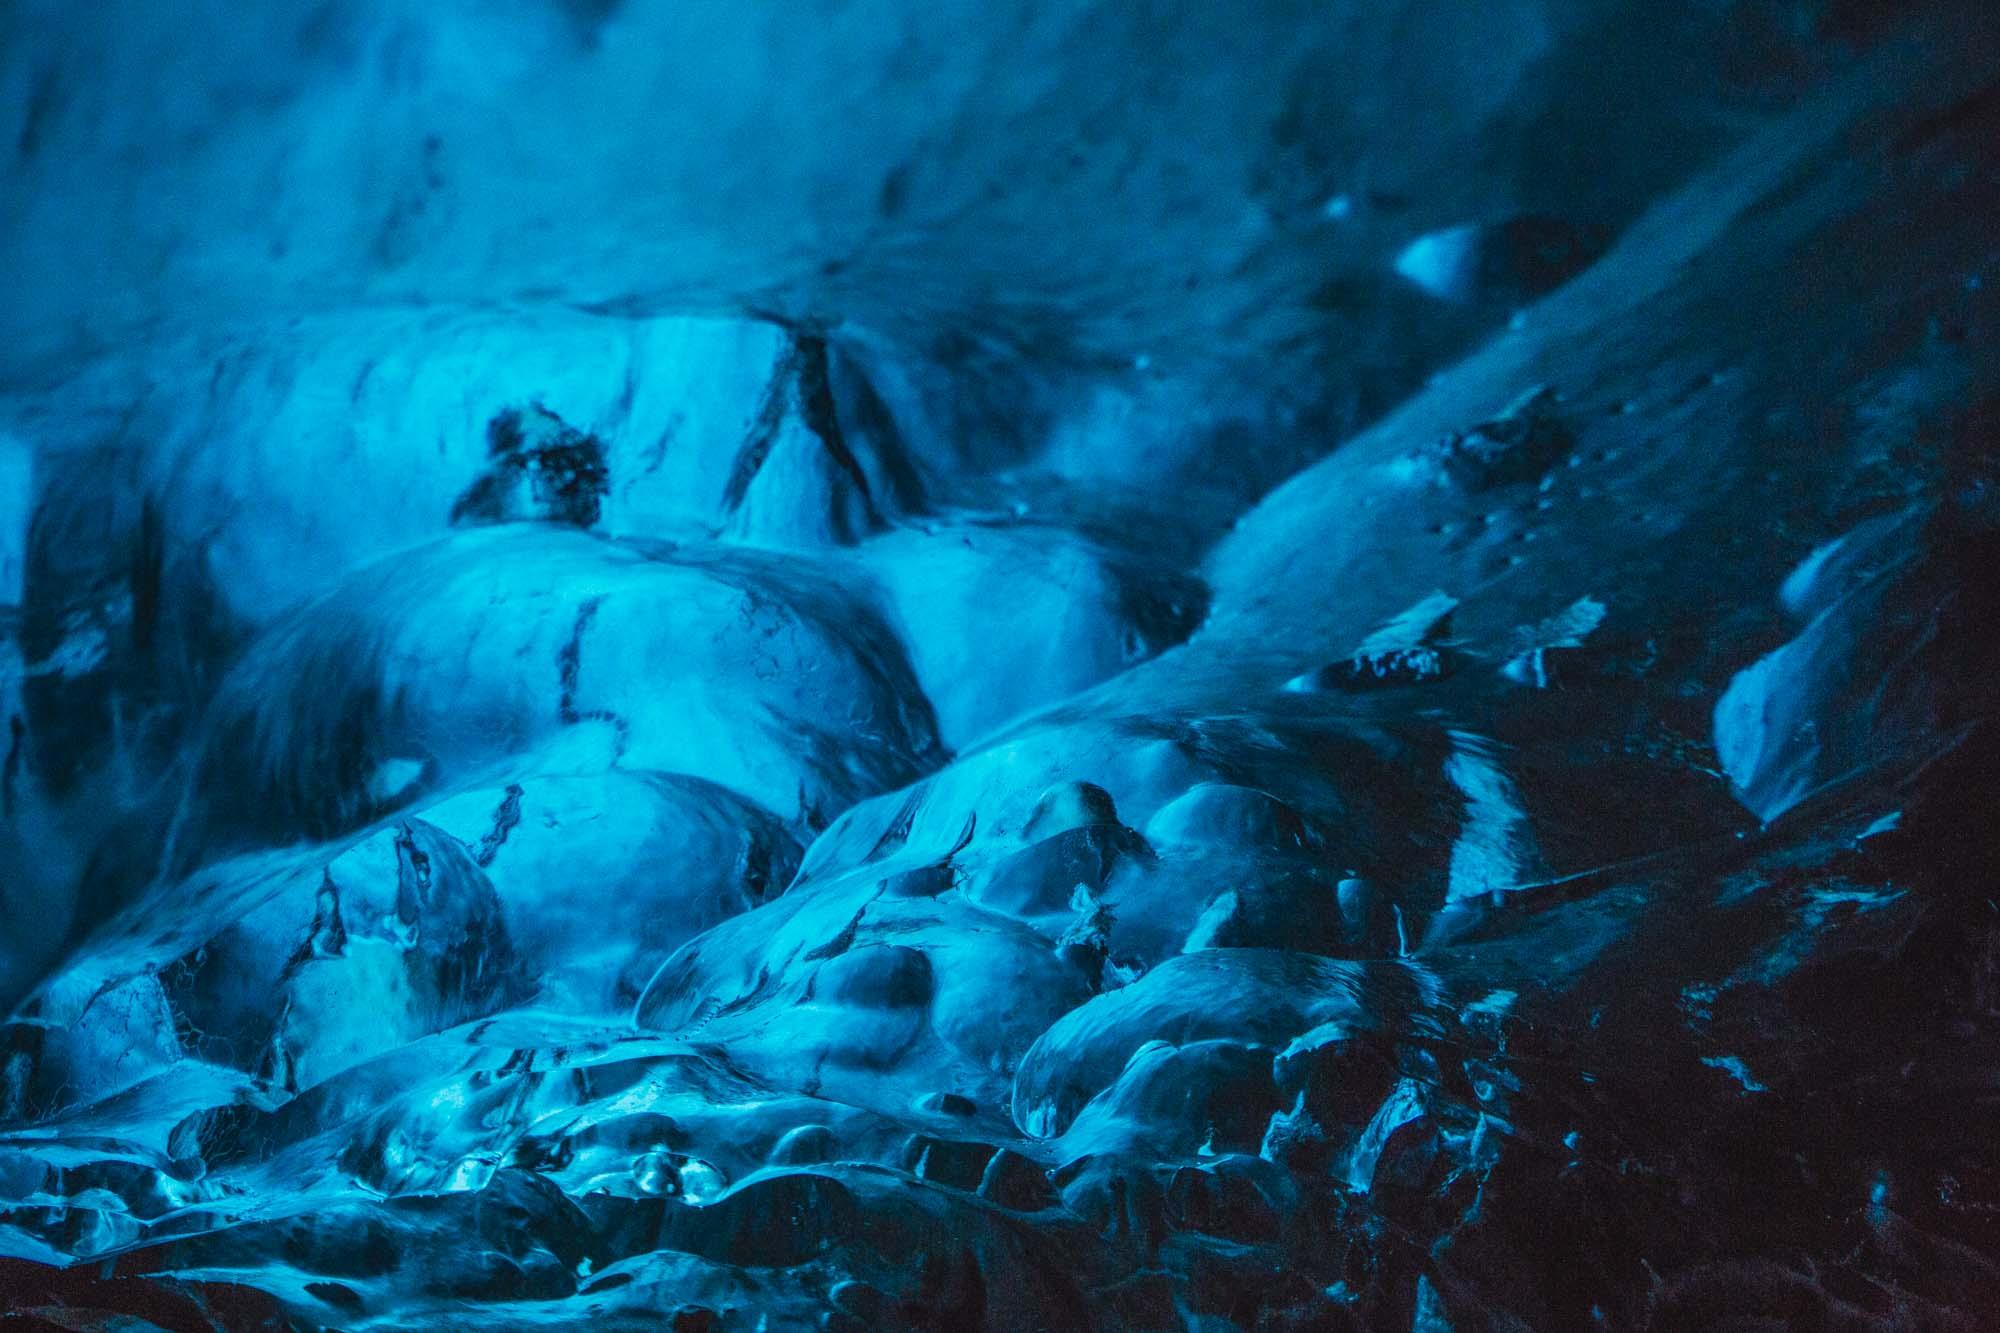 Ice Cave tour - Vatnajökull, Iceland